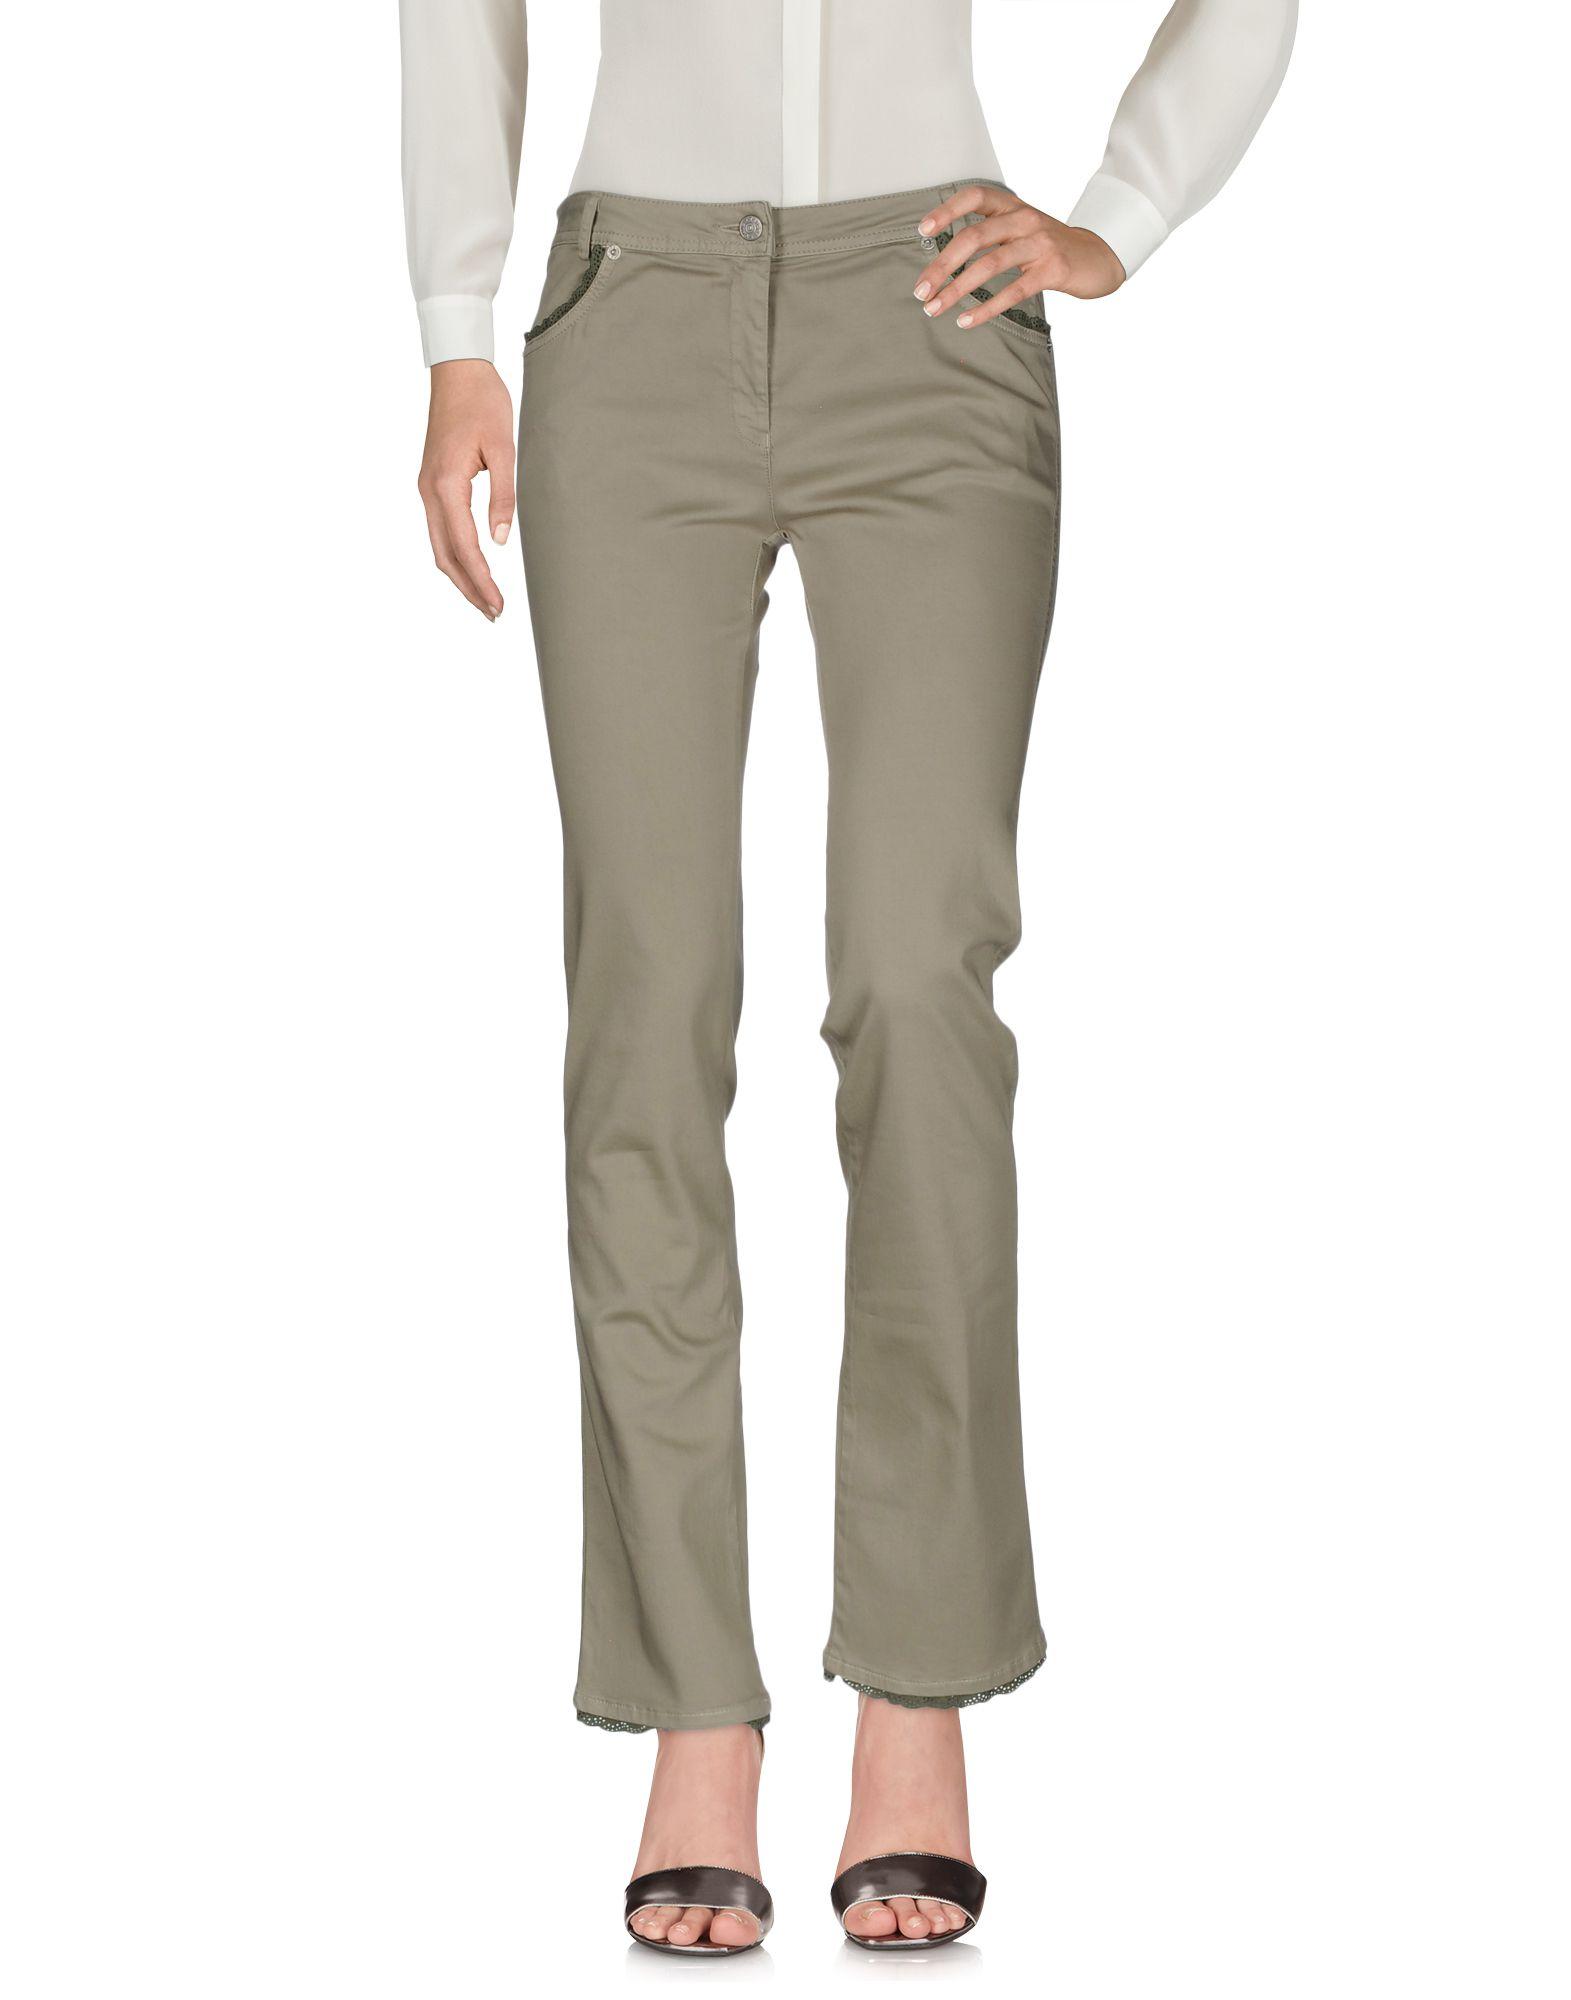 цена TRICOT CHIC Повседневные брюки онлайн в 2017 году